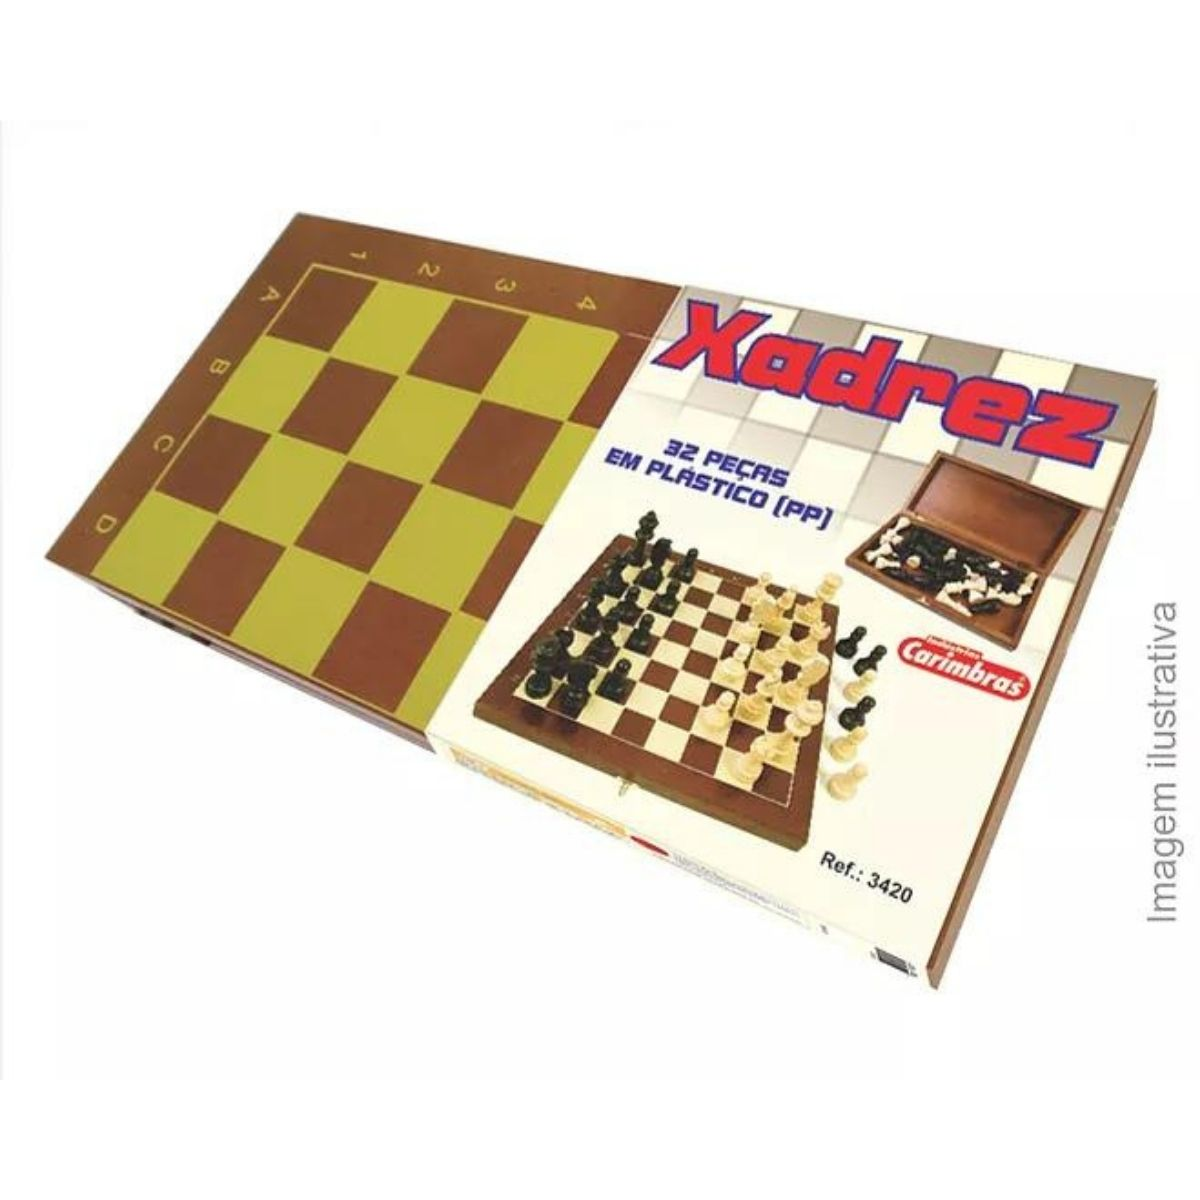 Brinquedo Educativo Jogo de Xadrez cx